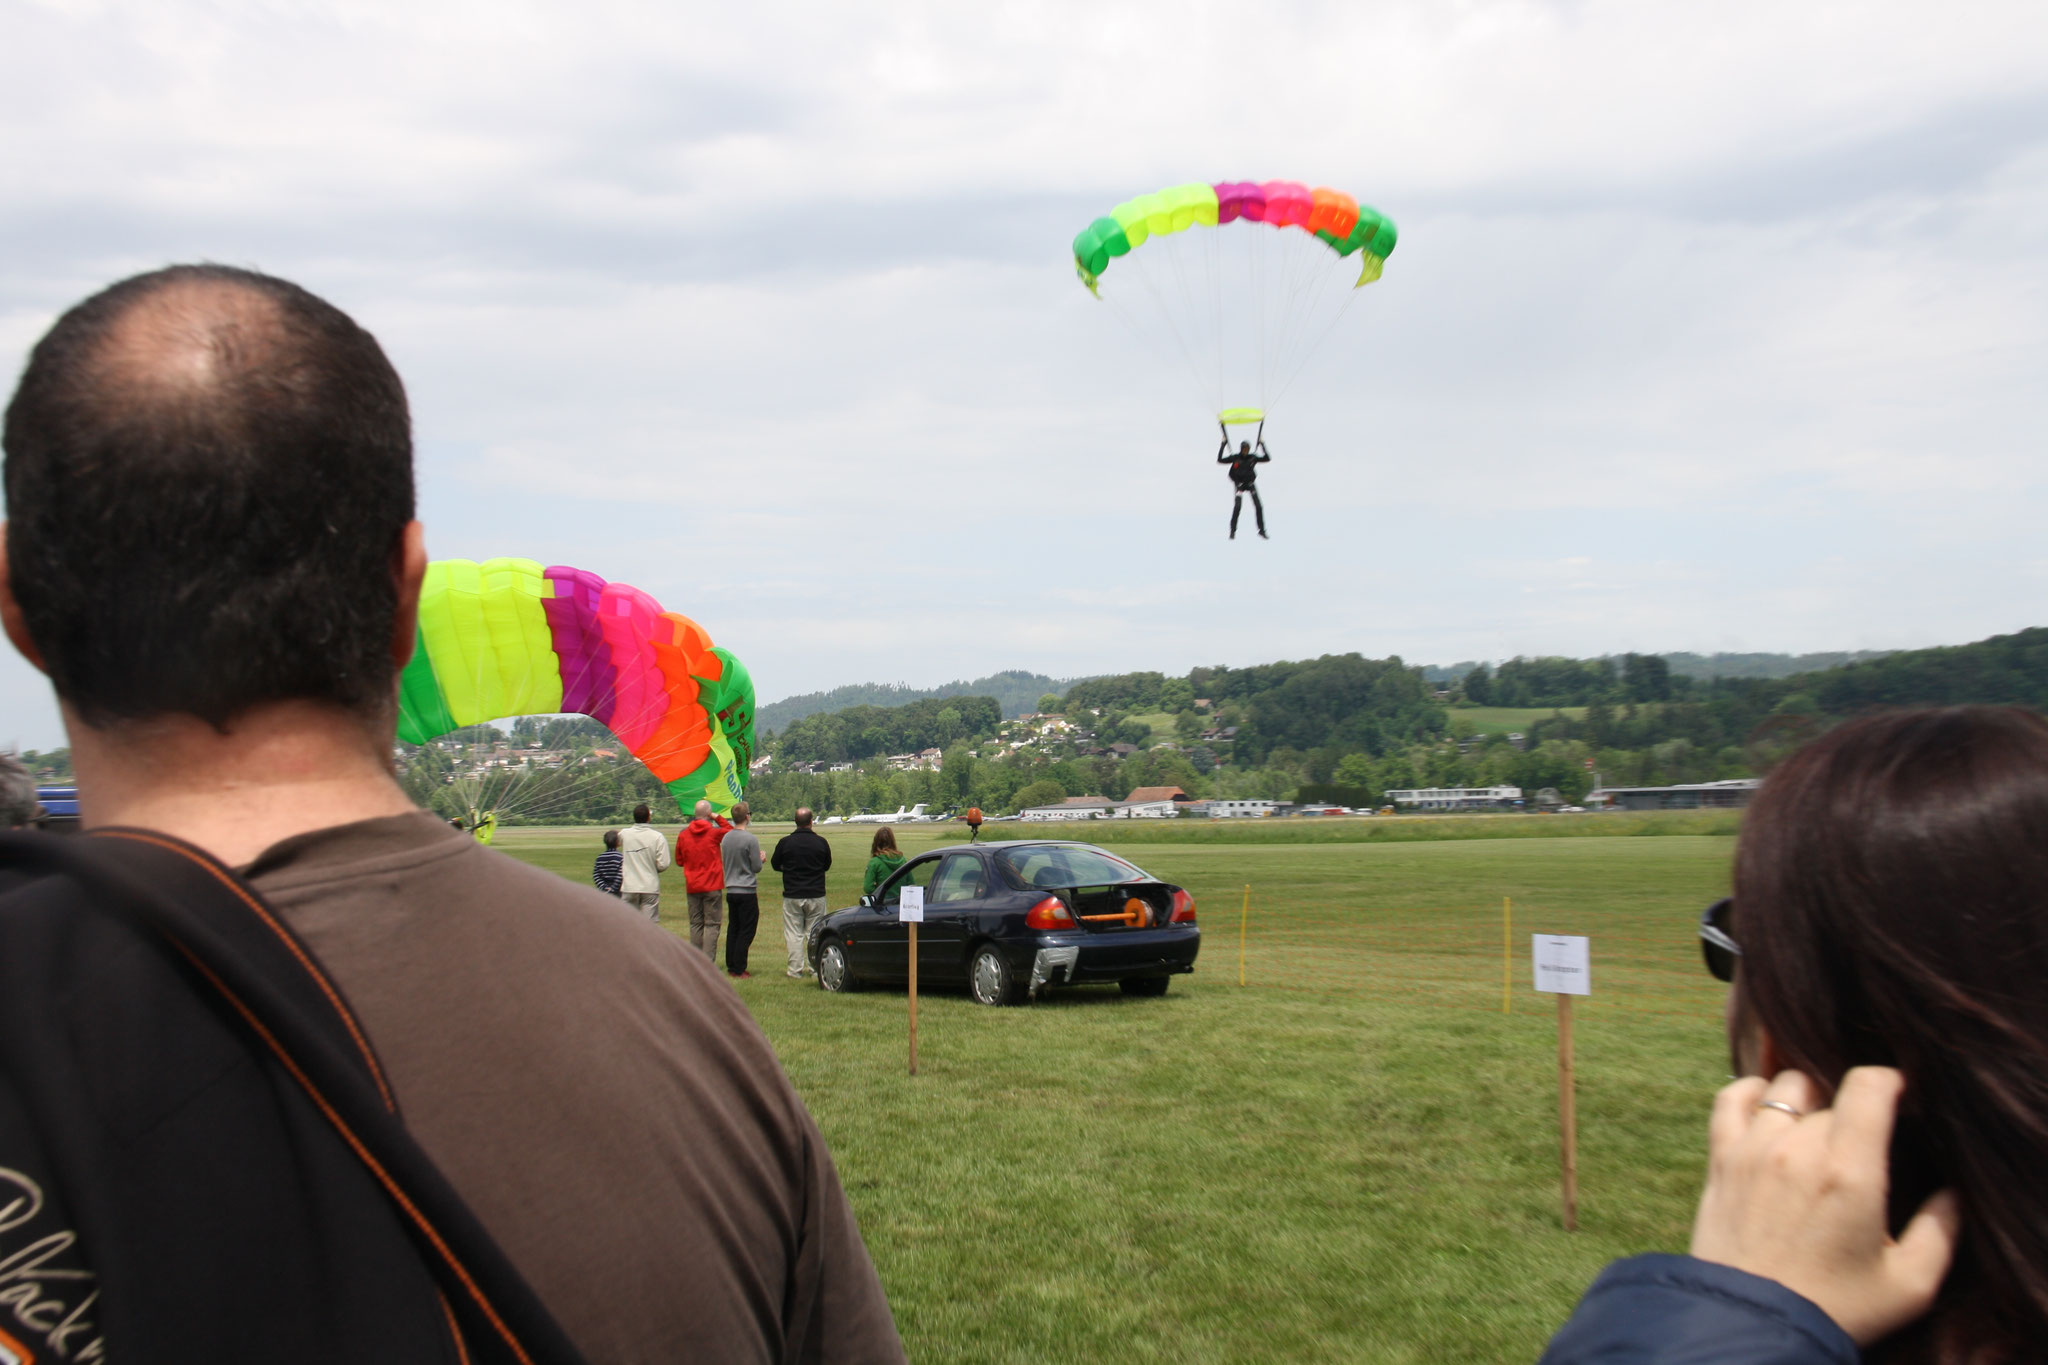 Die Fallschirmspringer